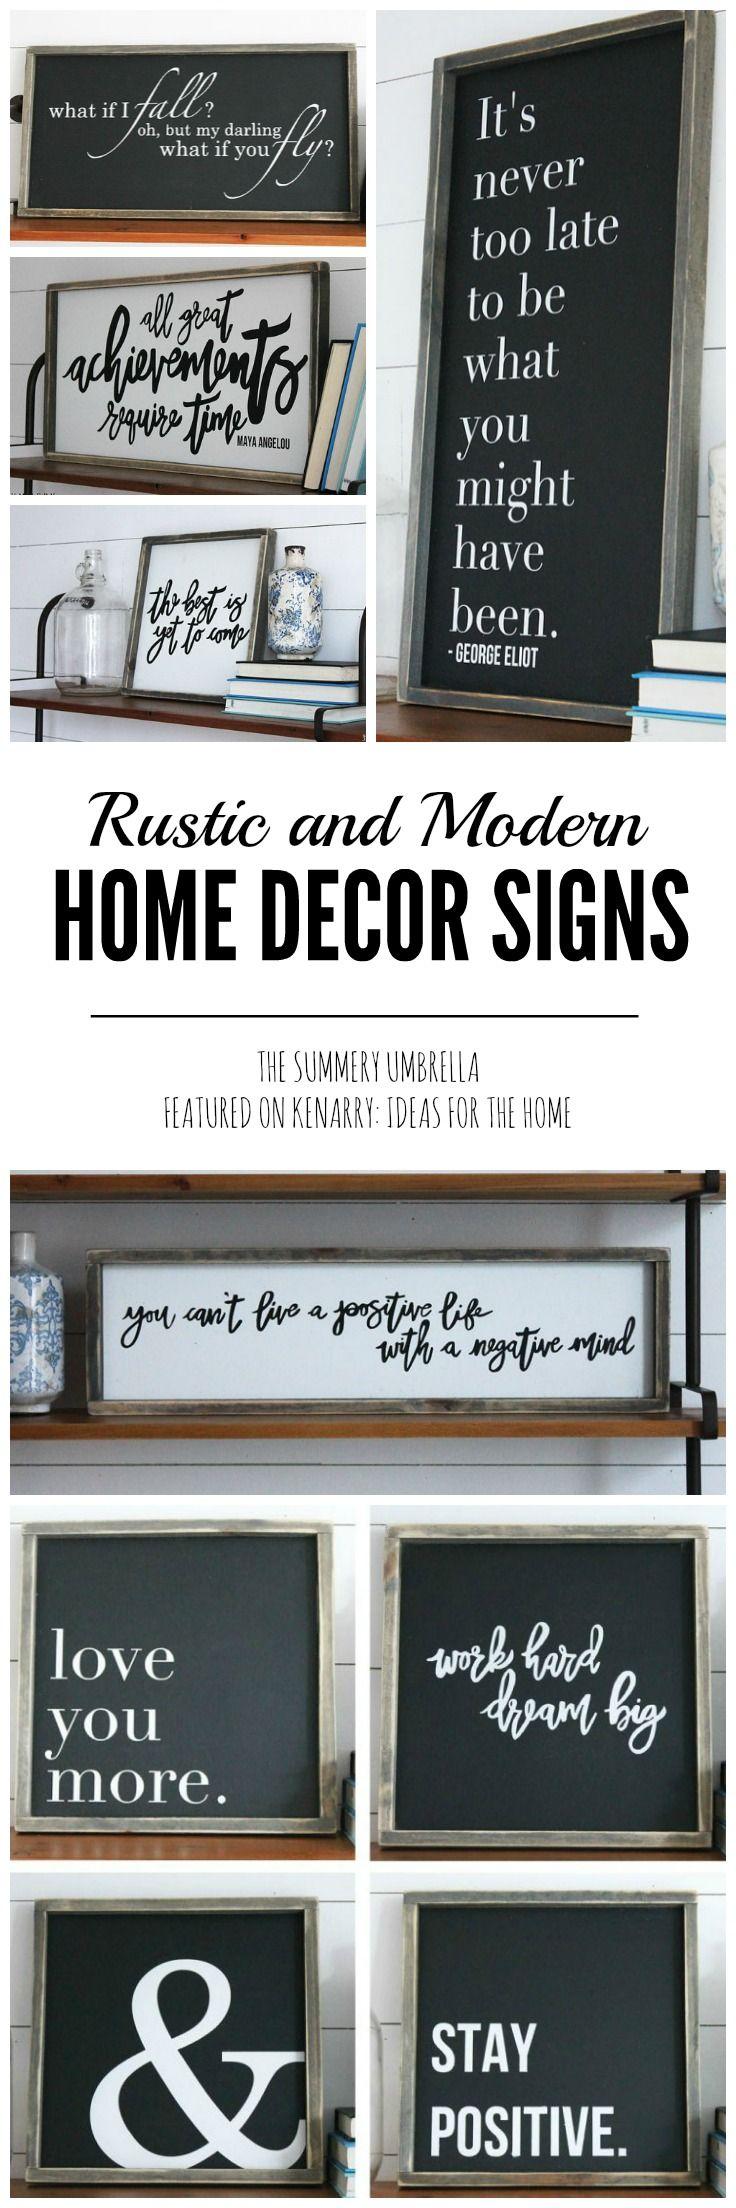 1008 Best Images About Cricut Craft Ideas On Pinterest Home Decorators Catalog Best Ideas of Home Decor and Design [homedecoratorscatalog.us]